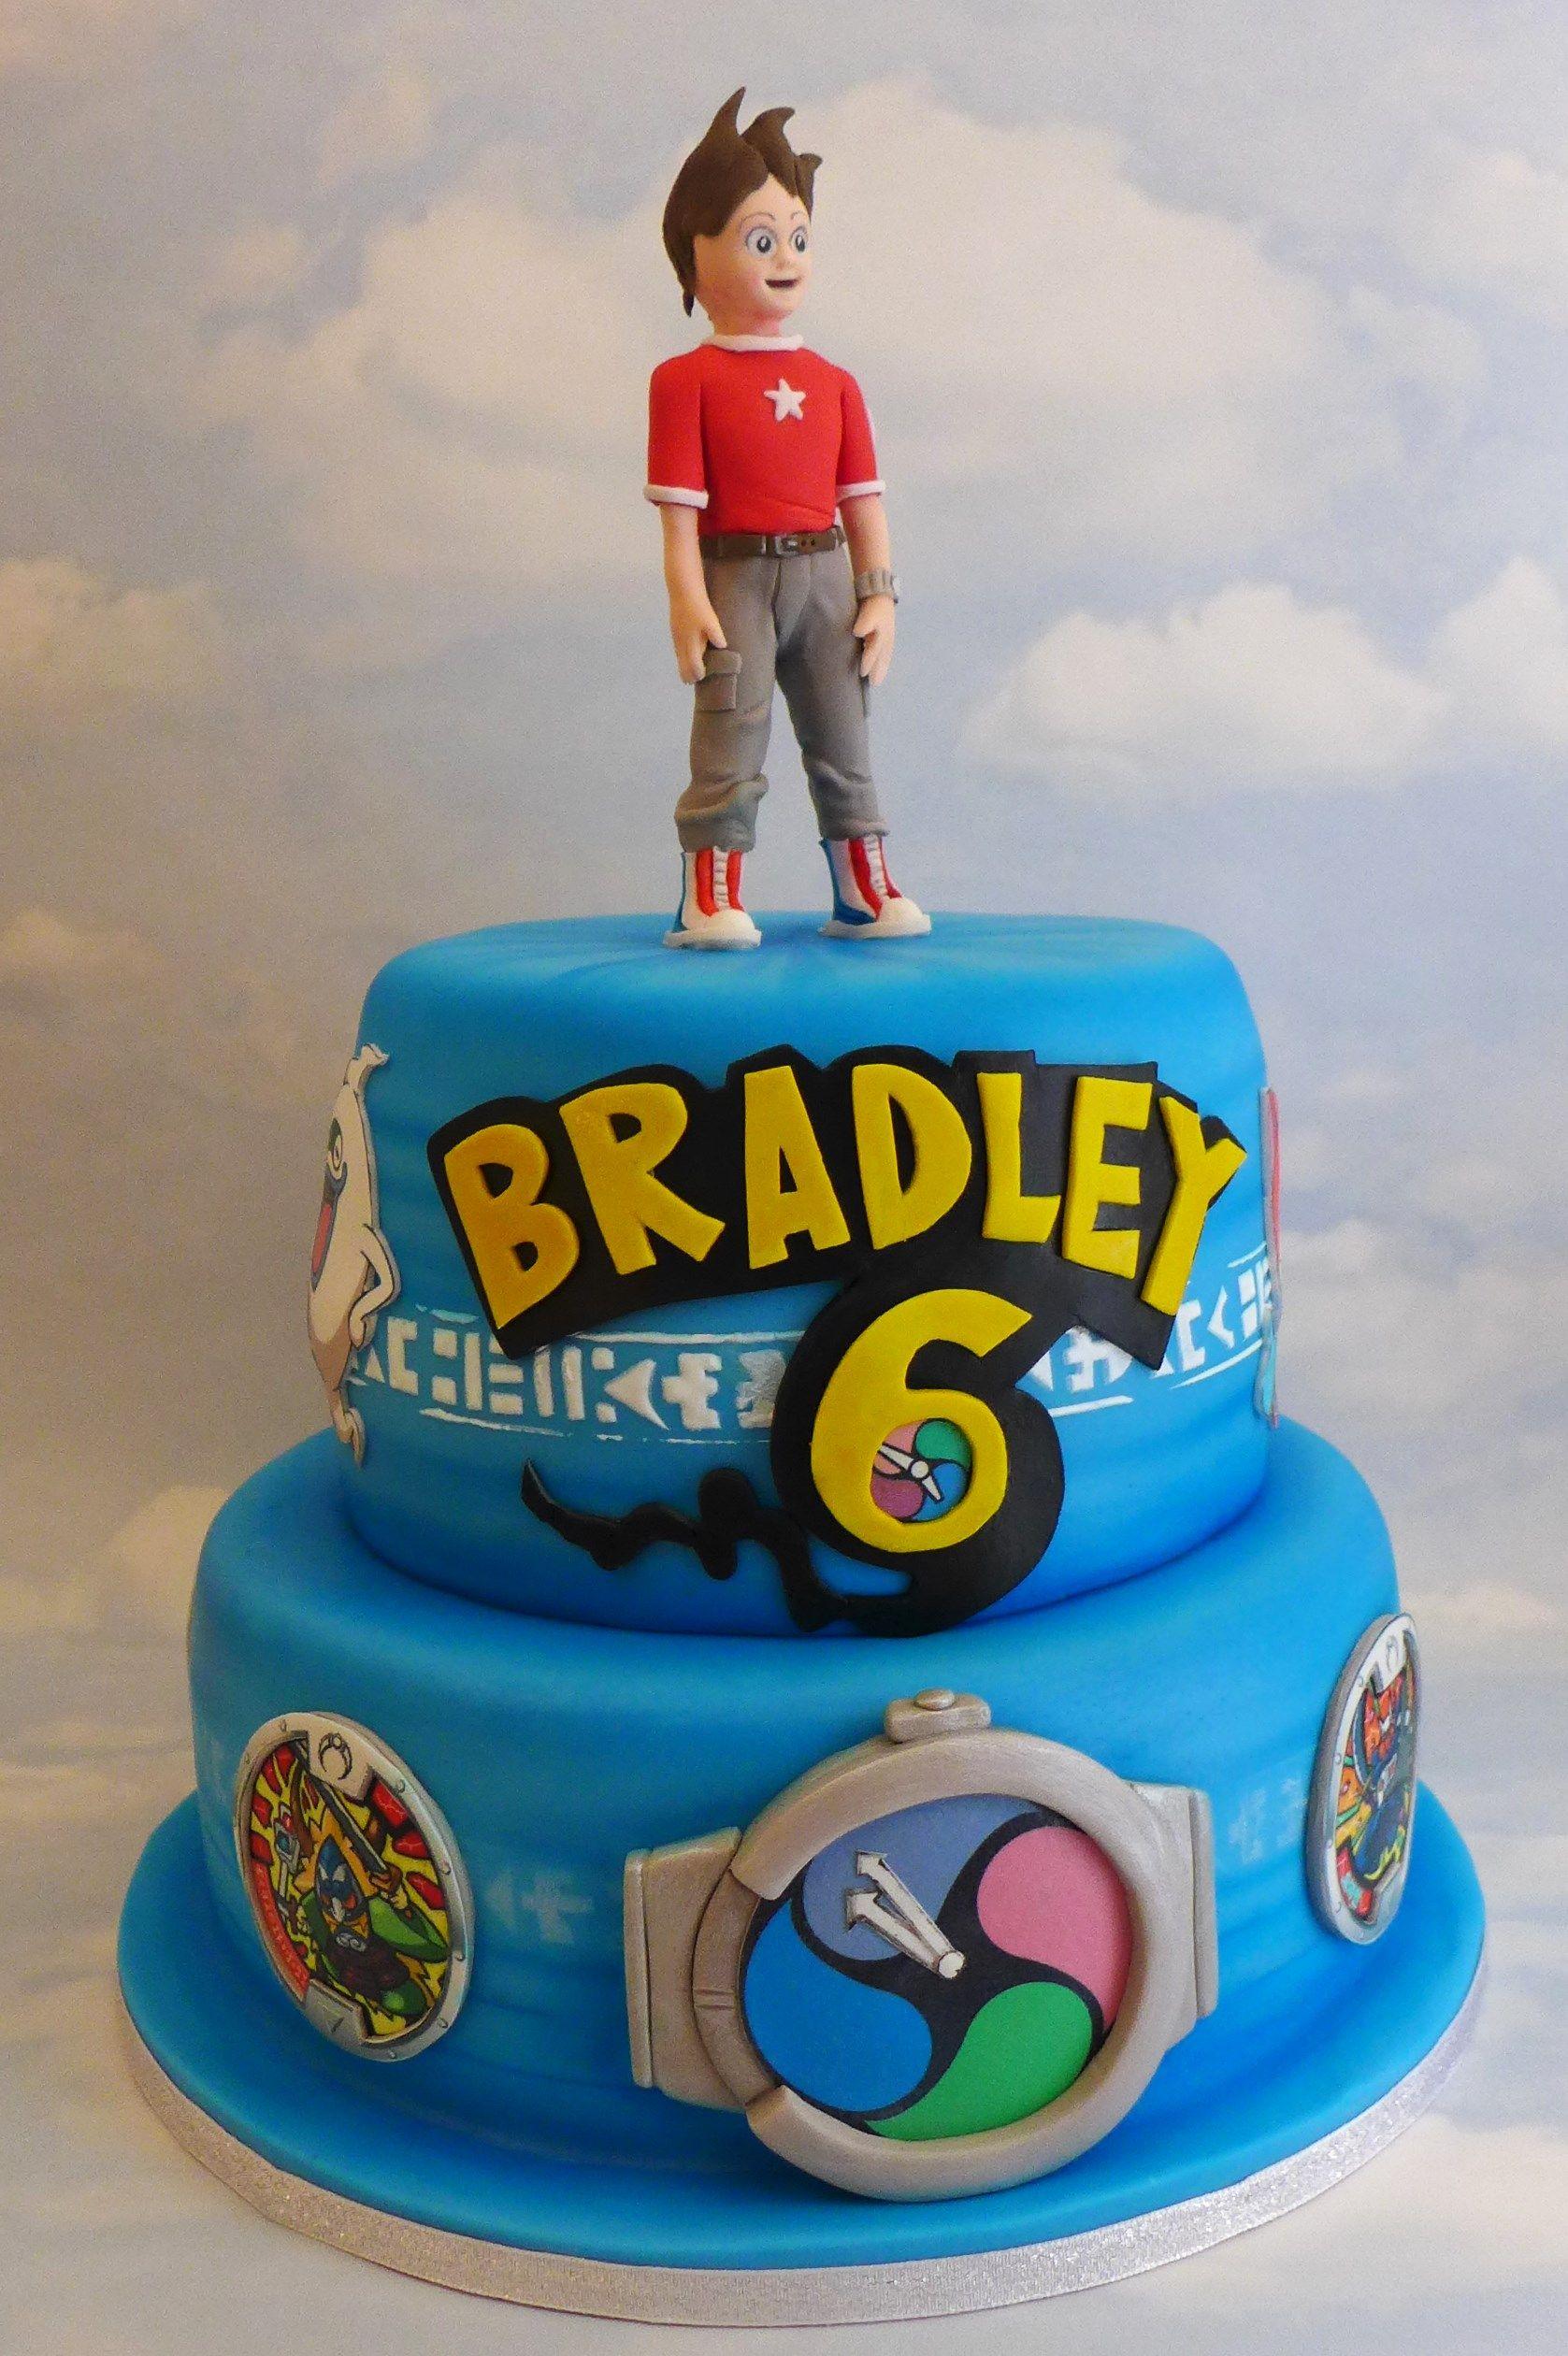 Yo kai watch birthday cake Visit us Facebookcommarissascake or